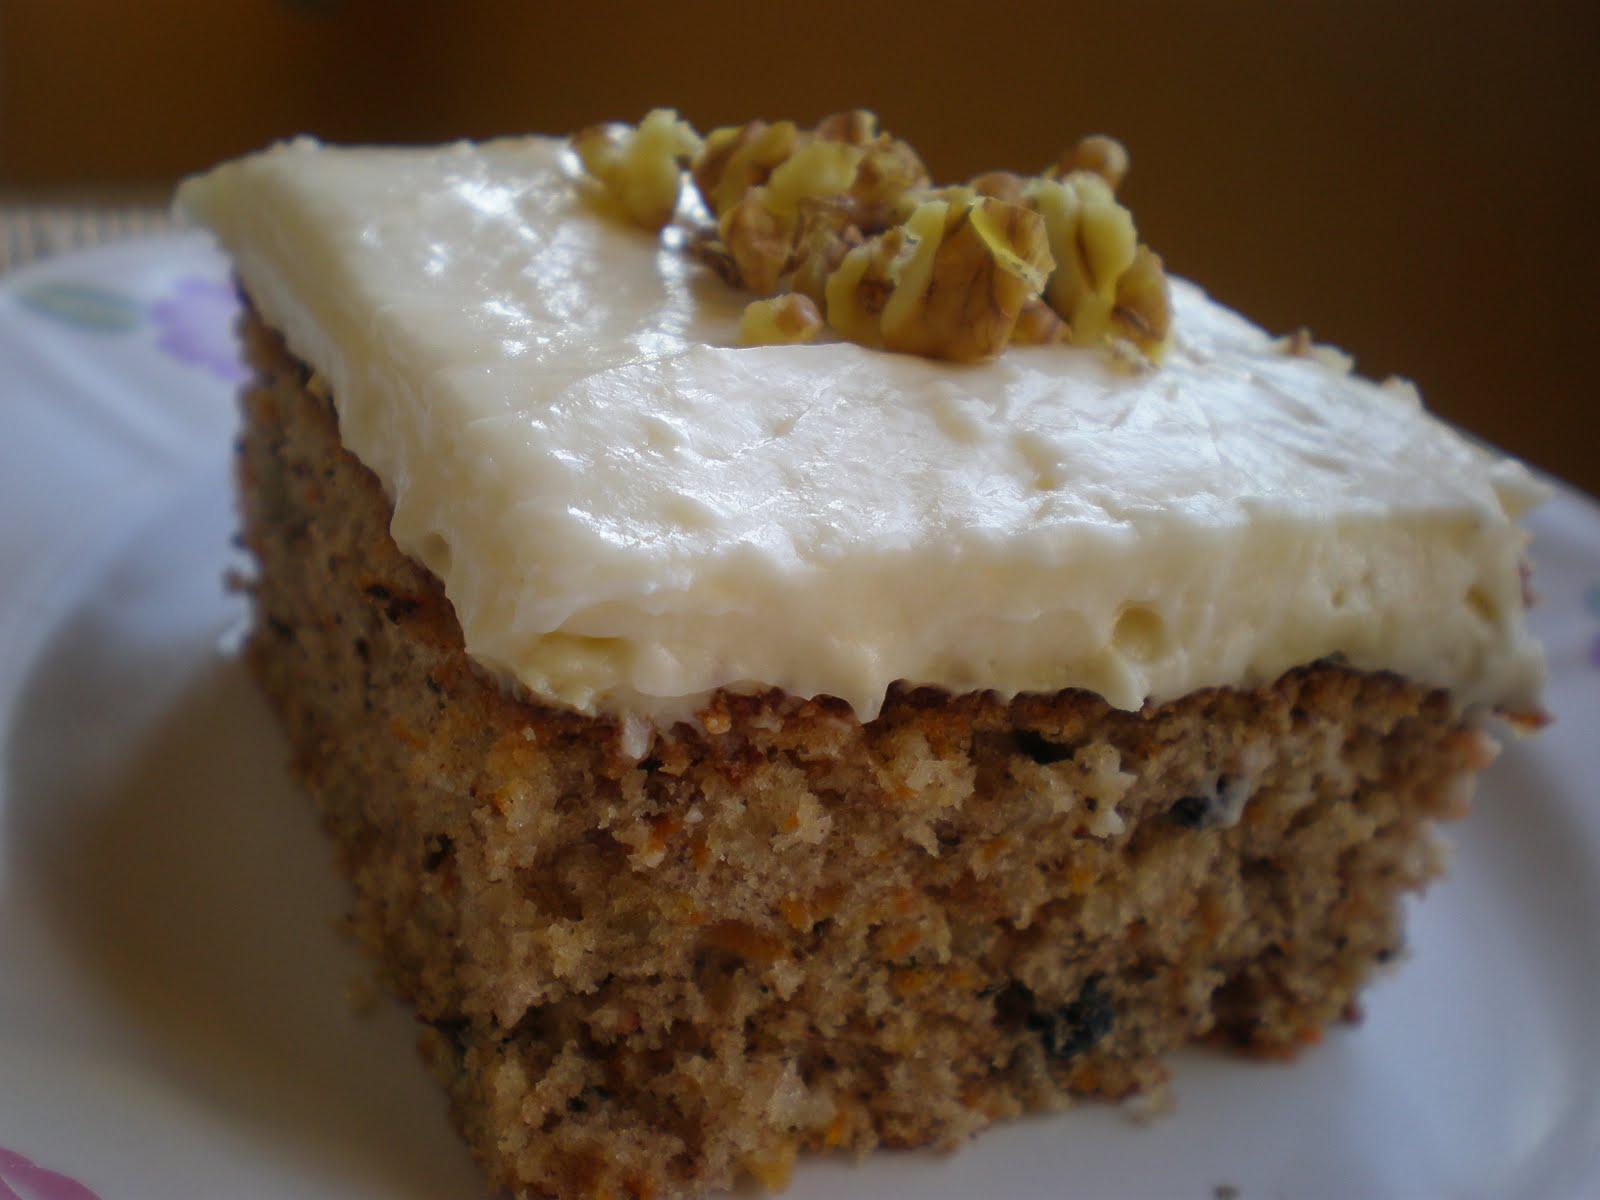 Havuçlu Pasta Tarifi - Havuçlu Pasta Tarifi Görselleri 3